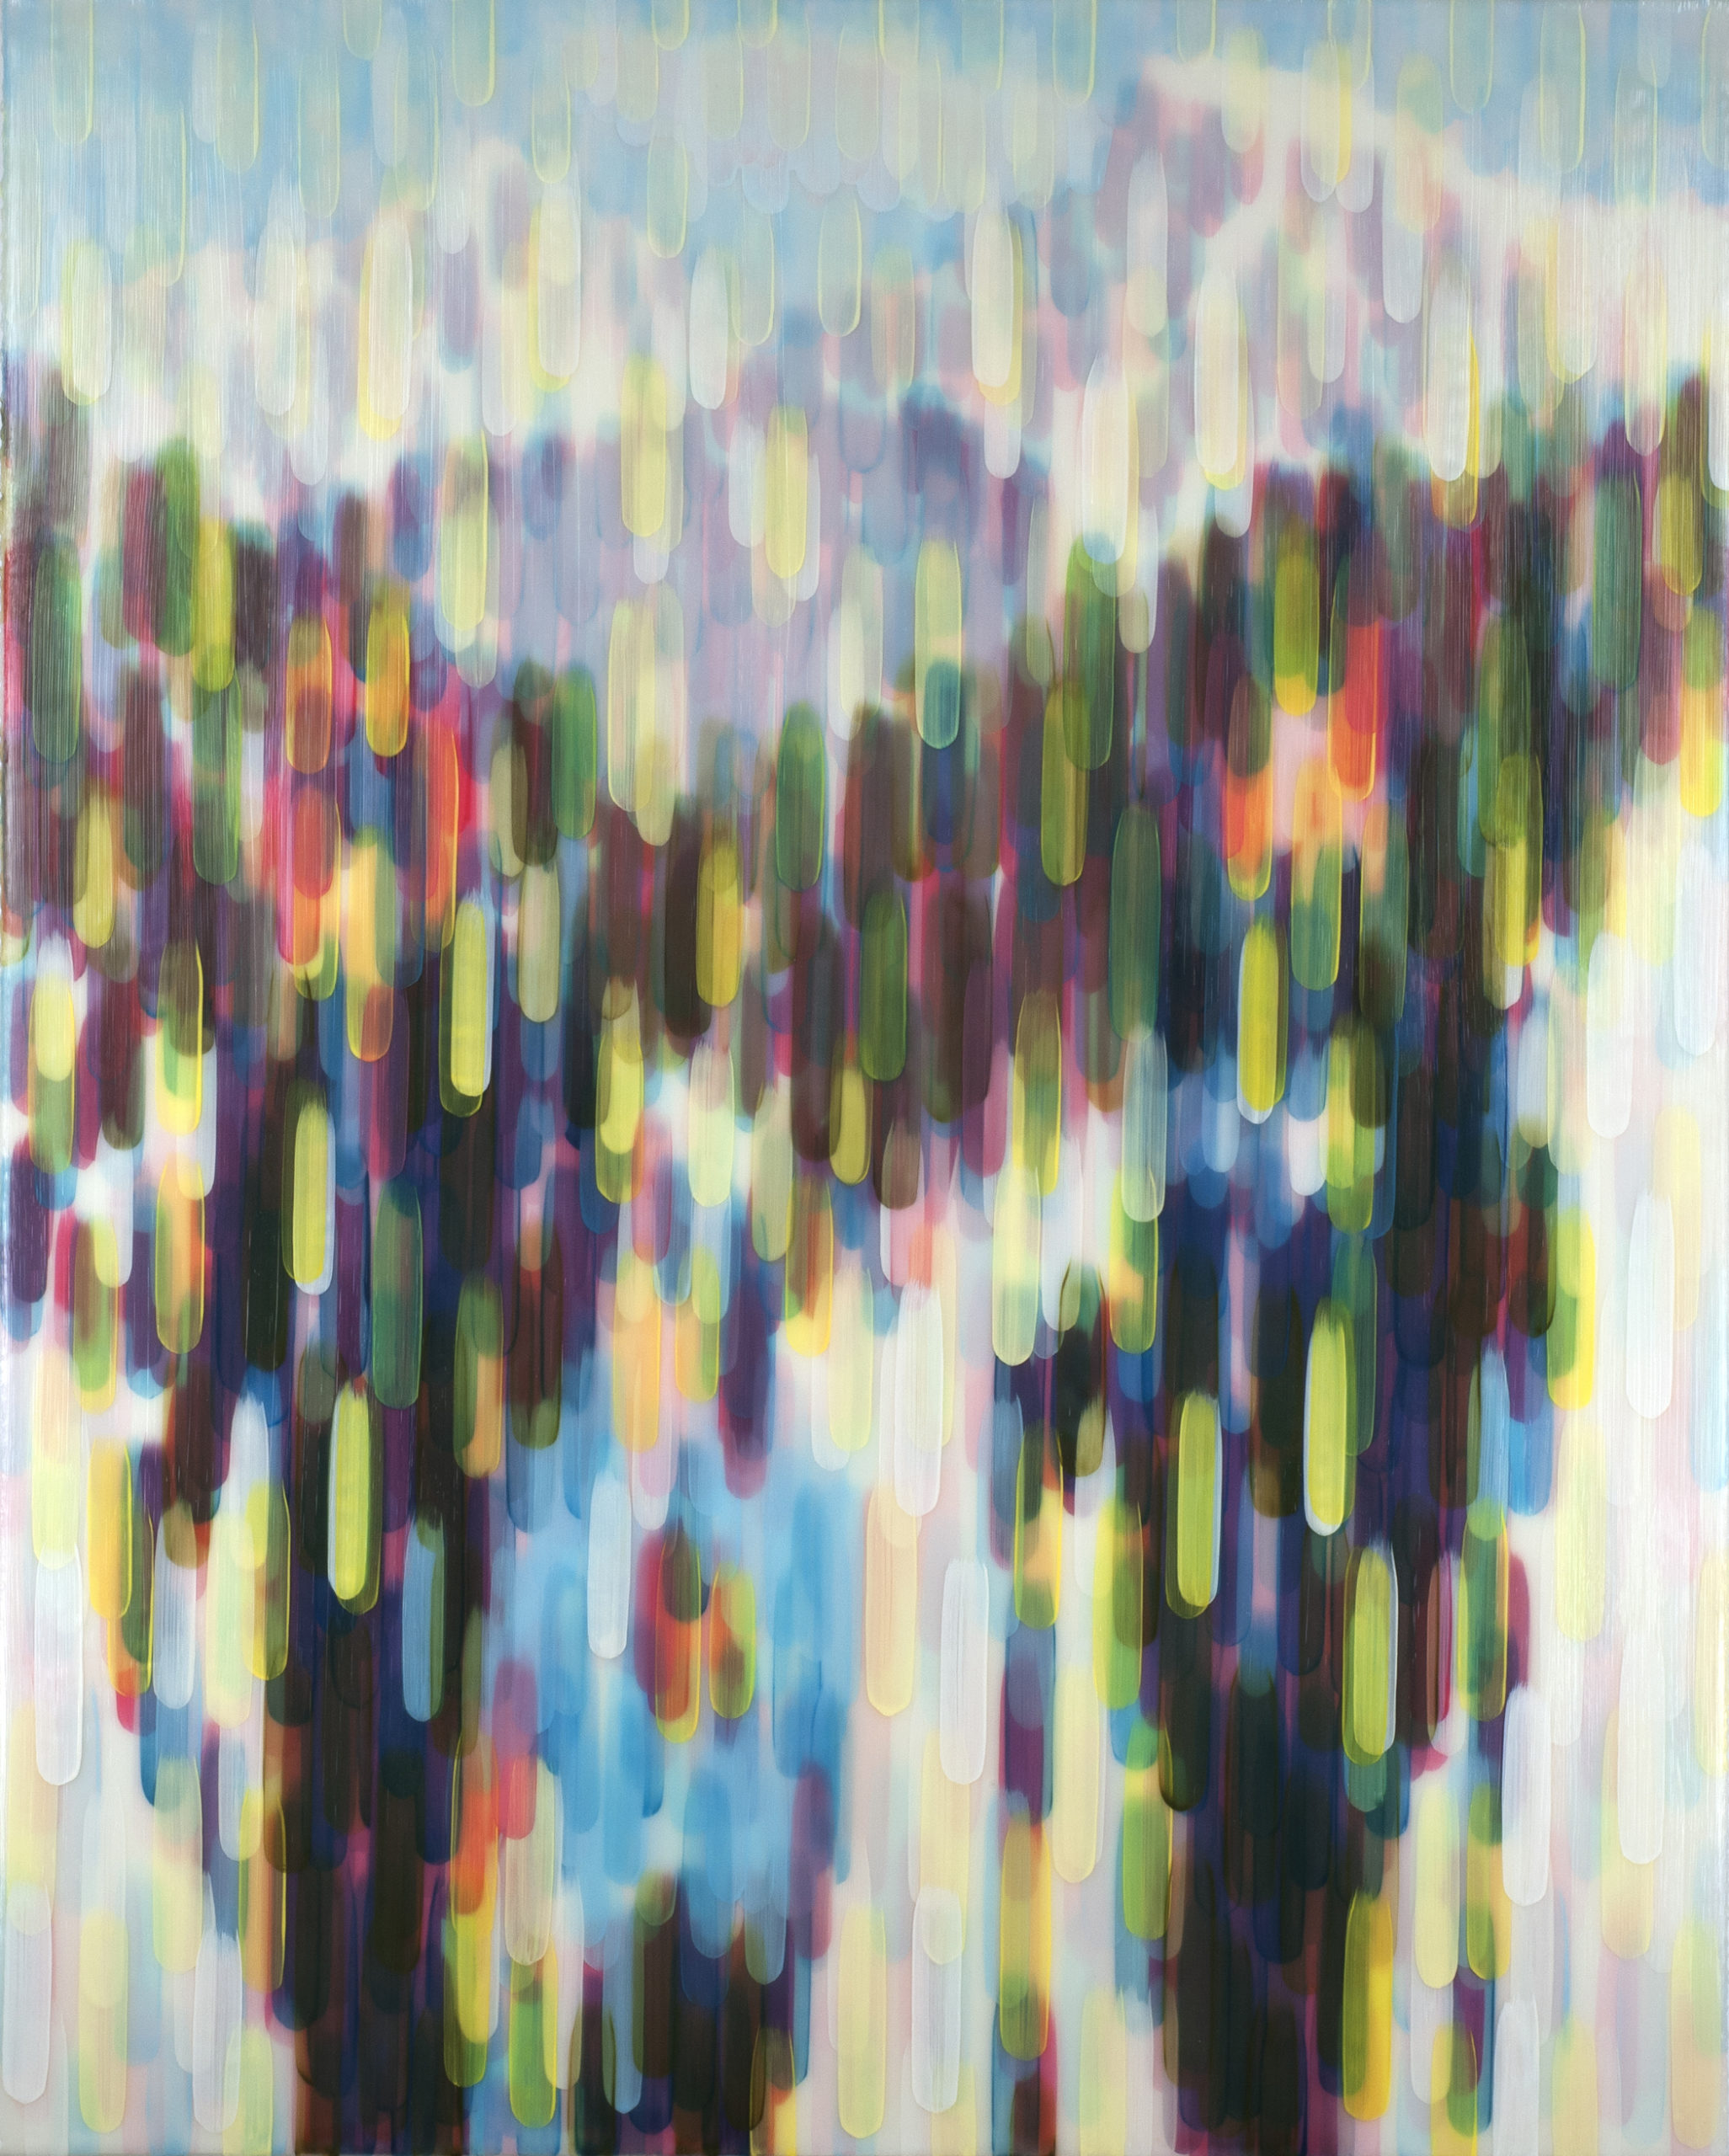 Sunshine Yellow 2014 acrylic on canvas on board 50x40in